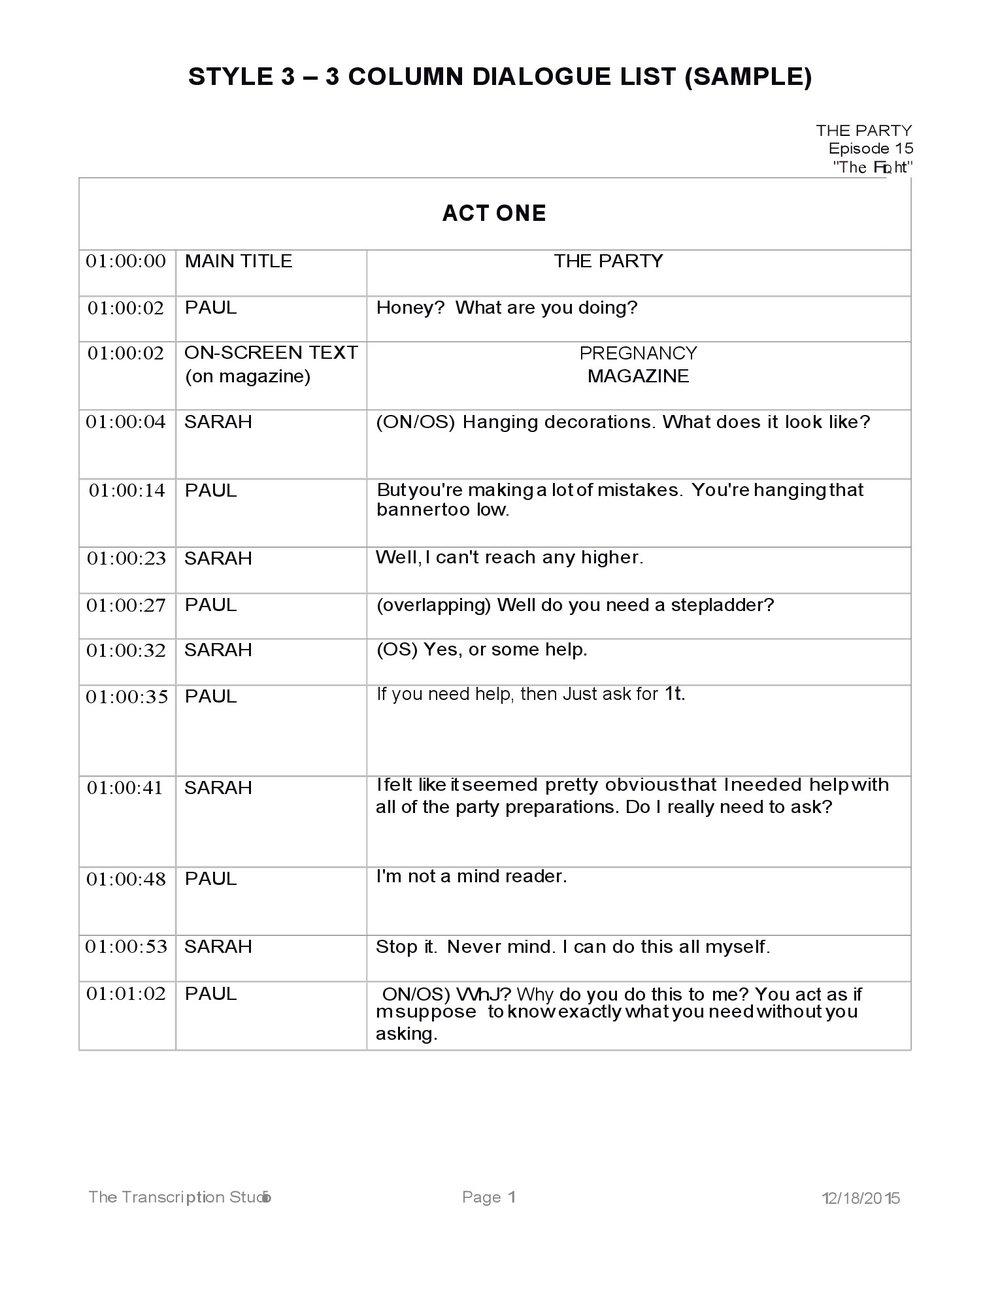 STYLE 3 –   3 COLUMN DIALOGUE LIST